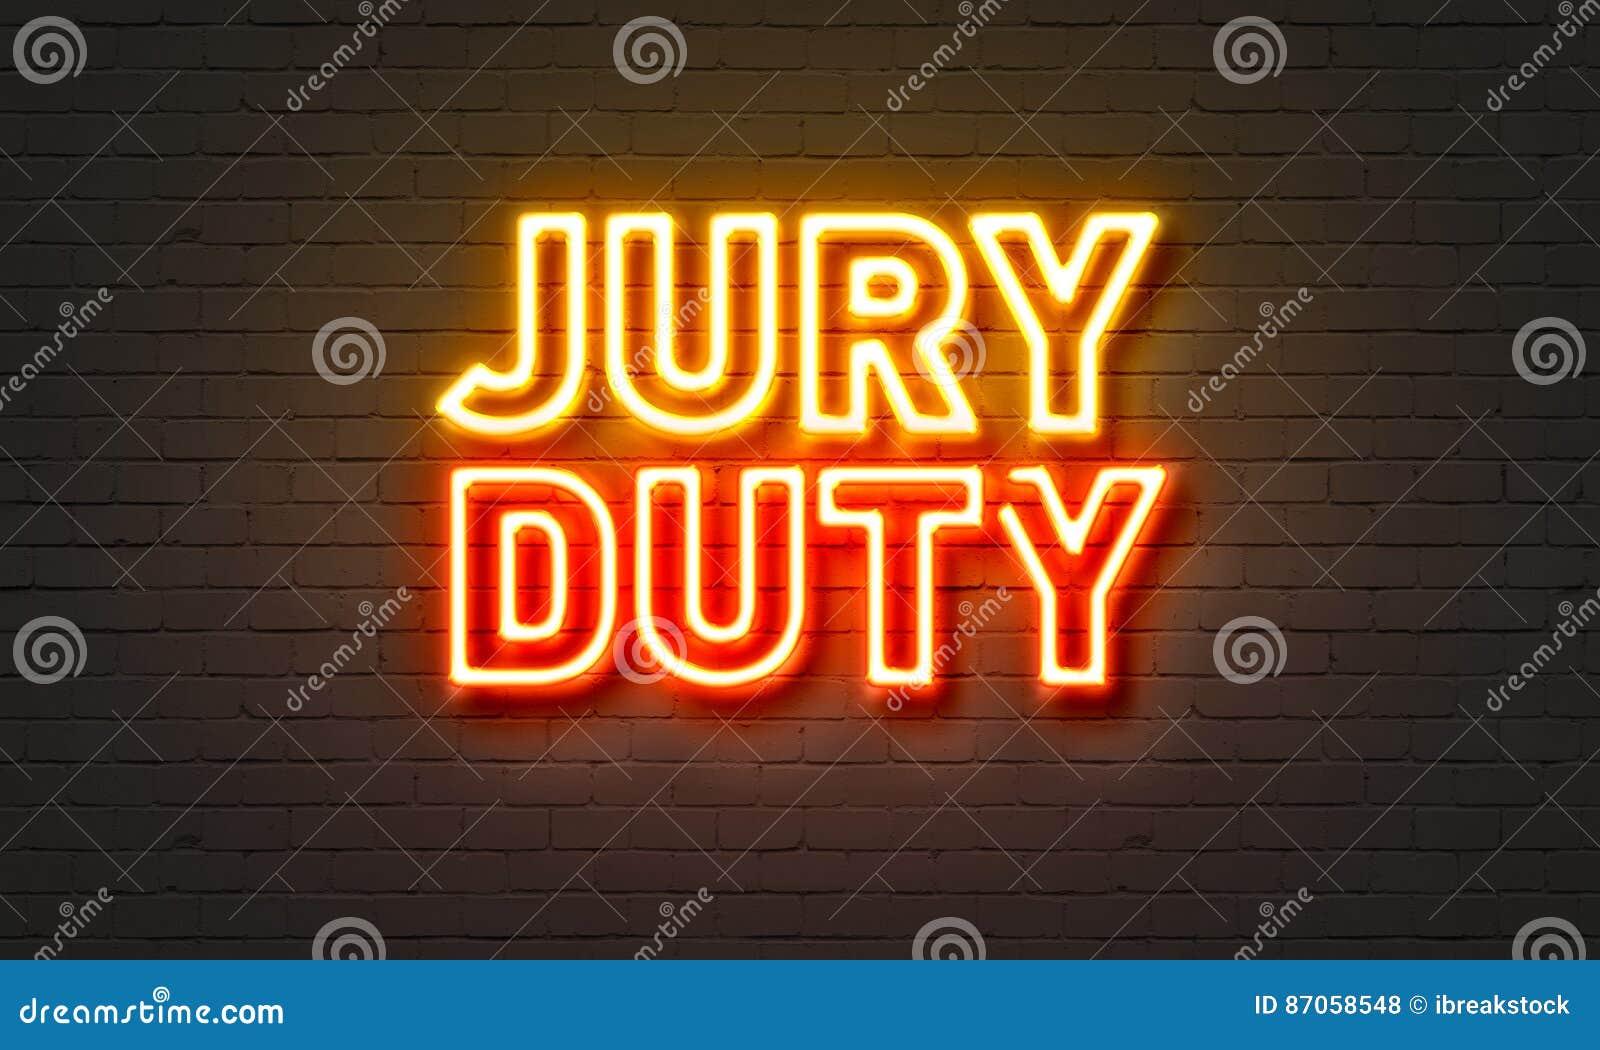 Jury duty neon sign on brick wall background.